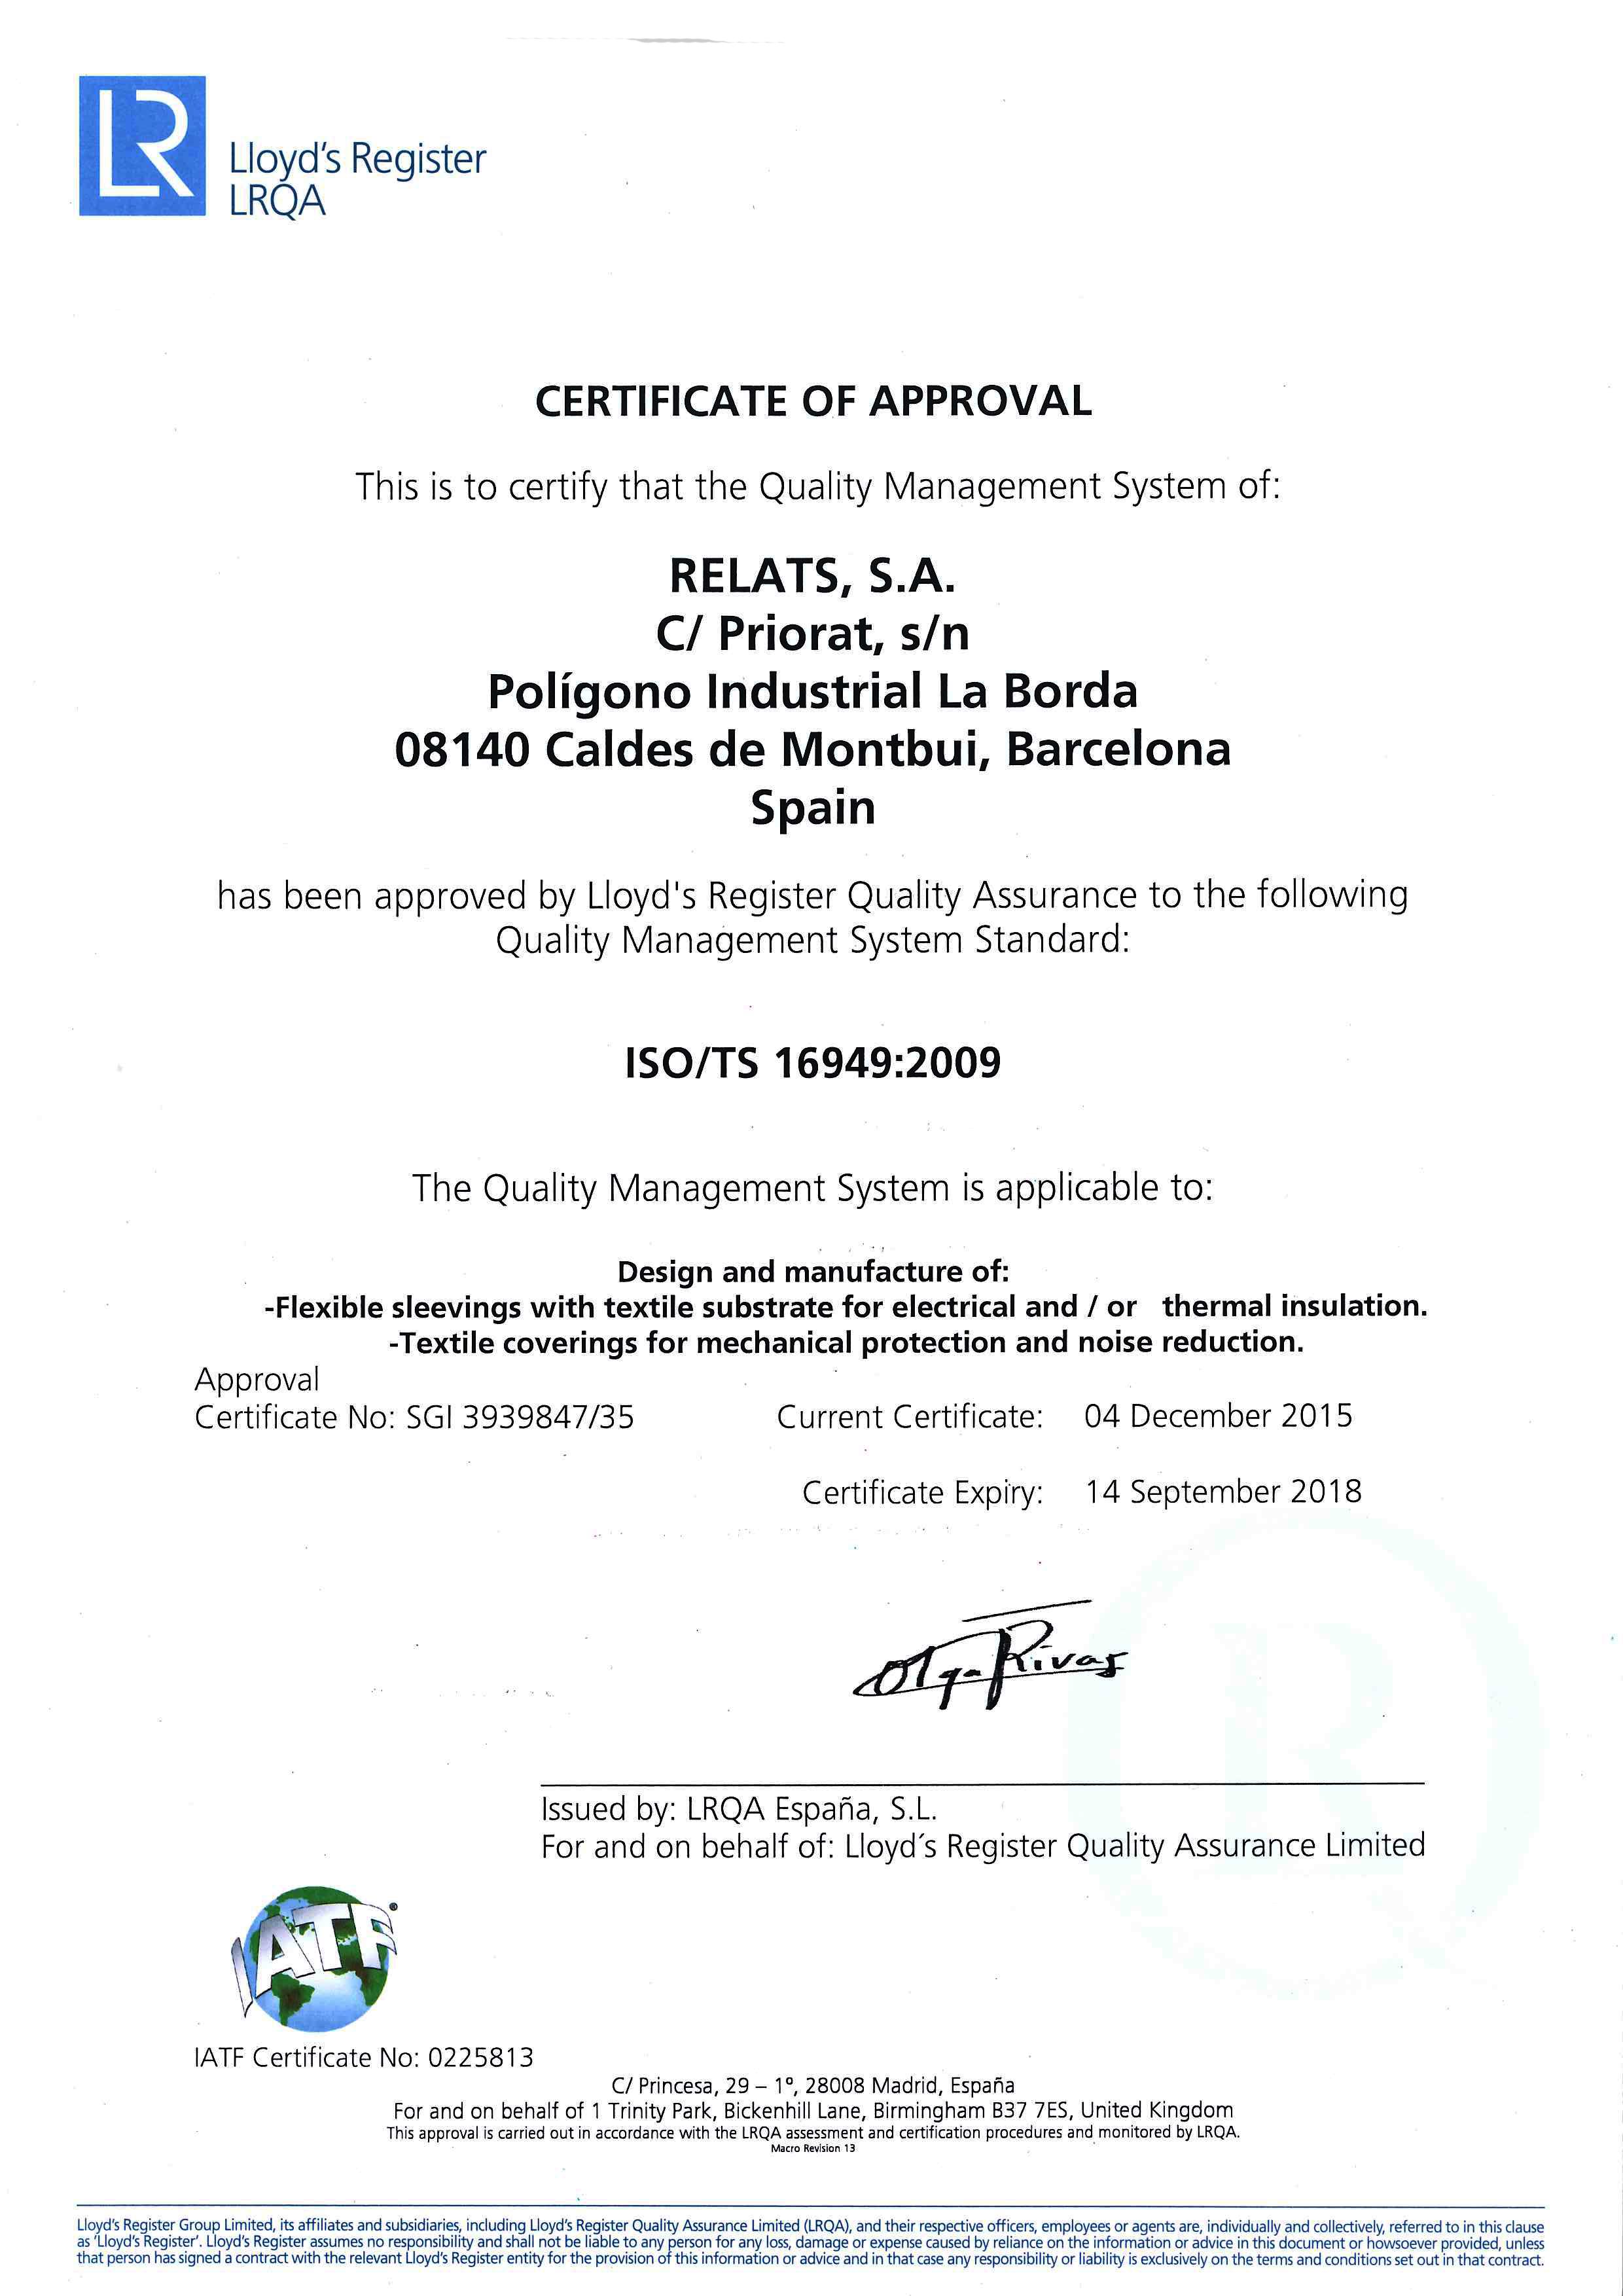 ISO/TS 16949:2009 Certificat Relats Caldes de Montbui